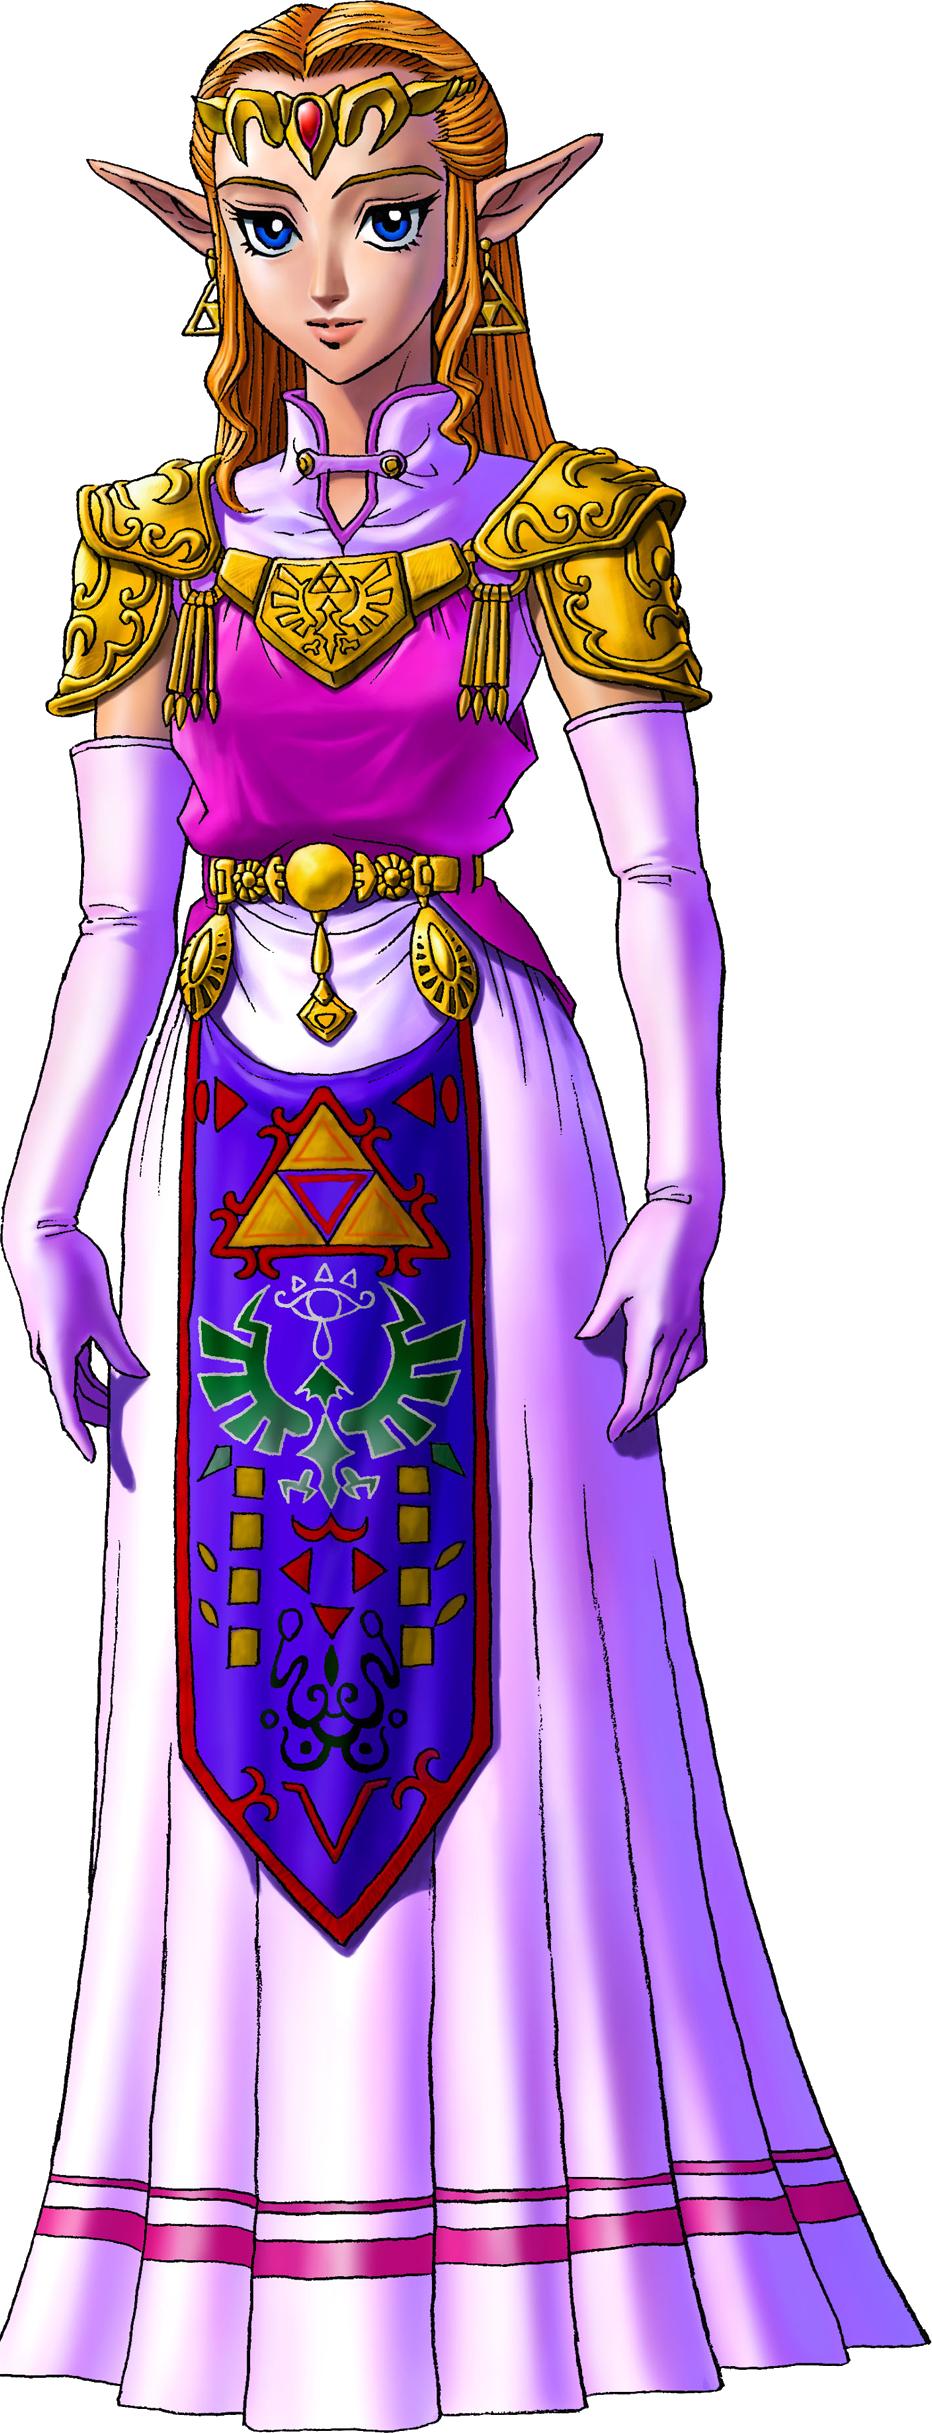 Princesse Zelda Ocarina Of Time : princesse, zelda, ocarina, Legend, Zelda:, Ocarina, Characters, Princess, Zelda, Costume,, Cosplay